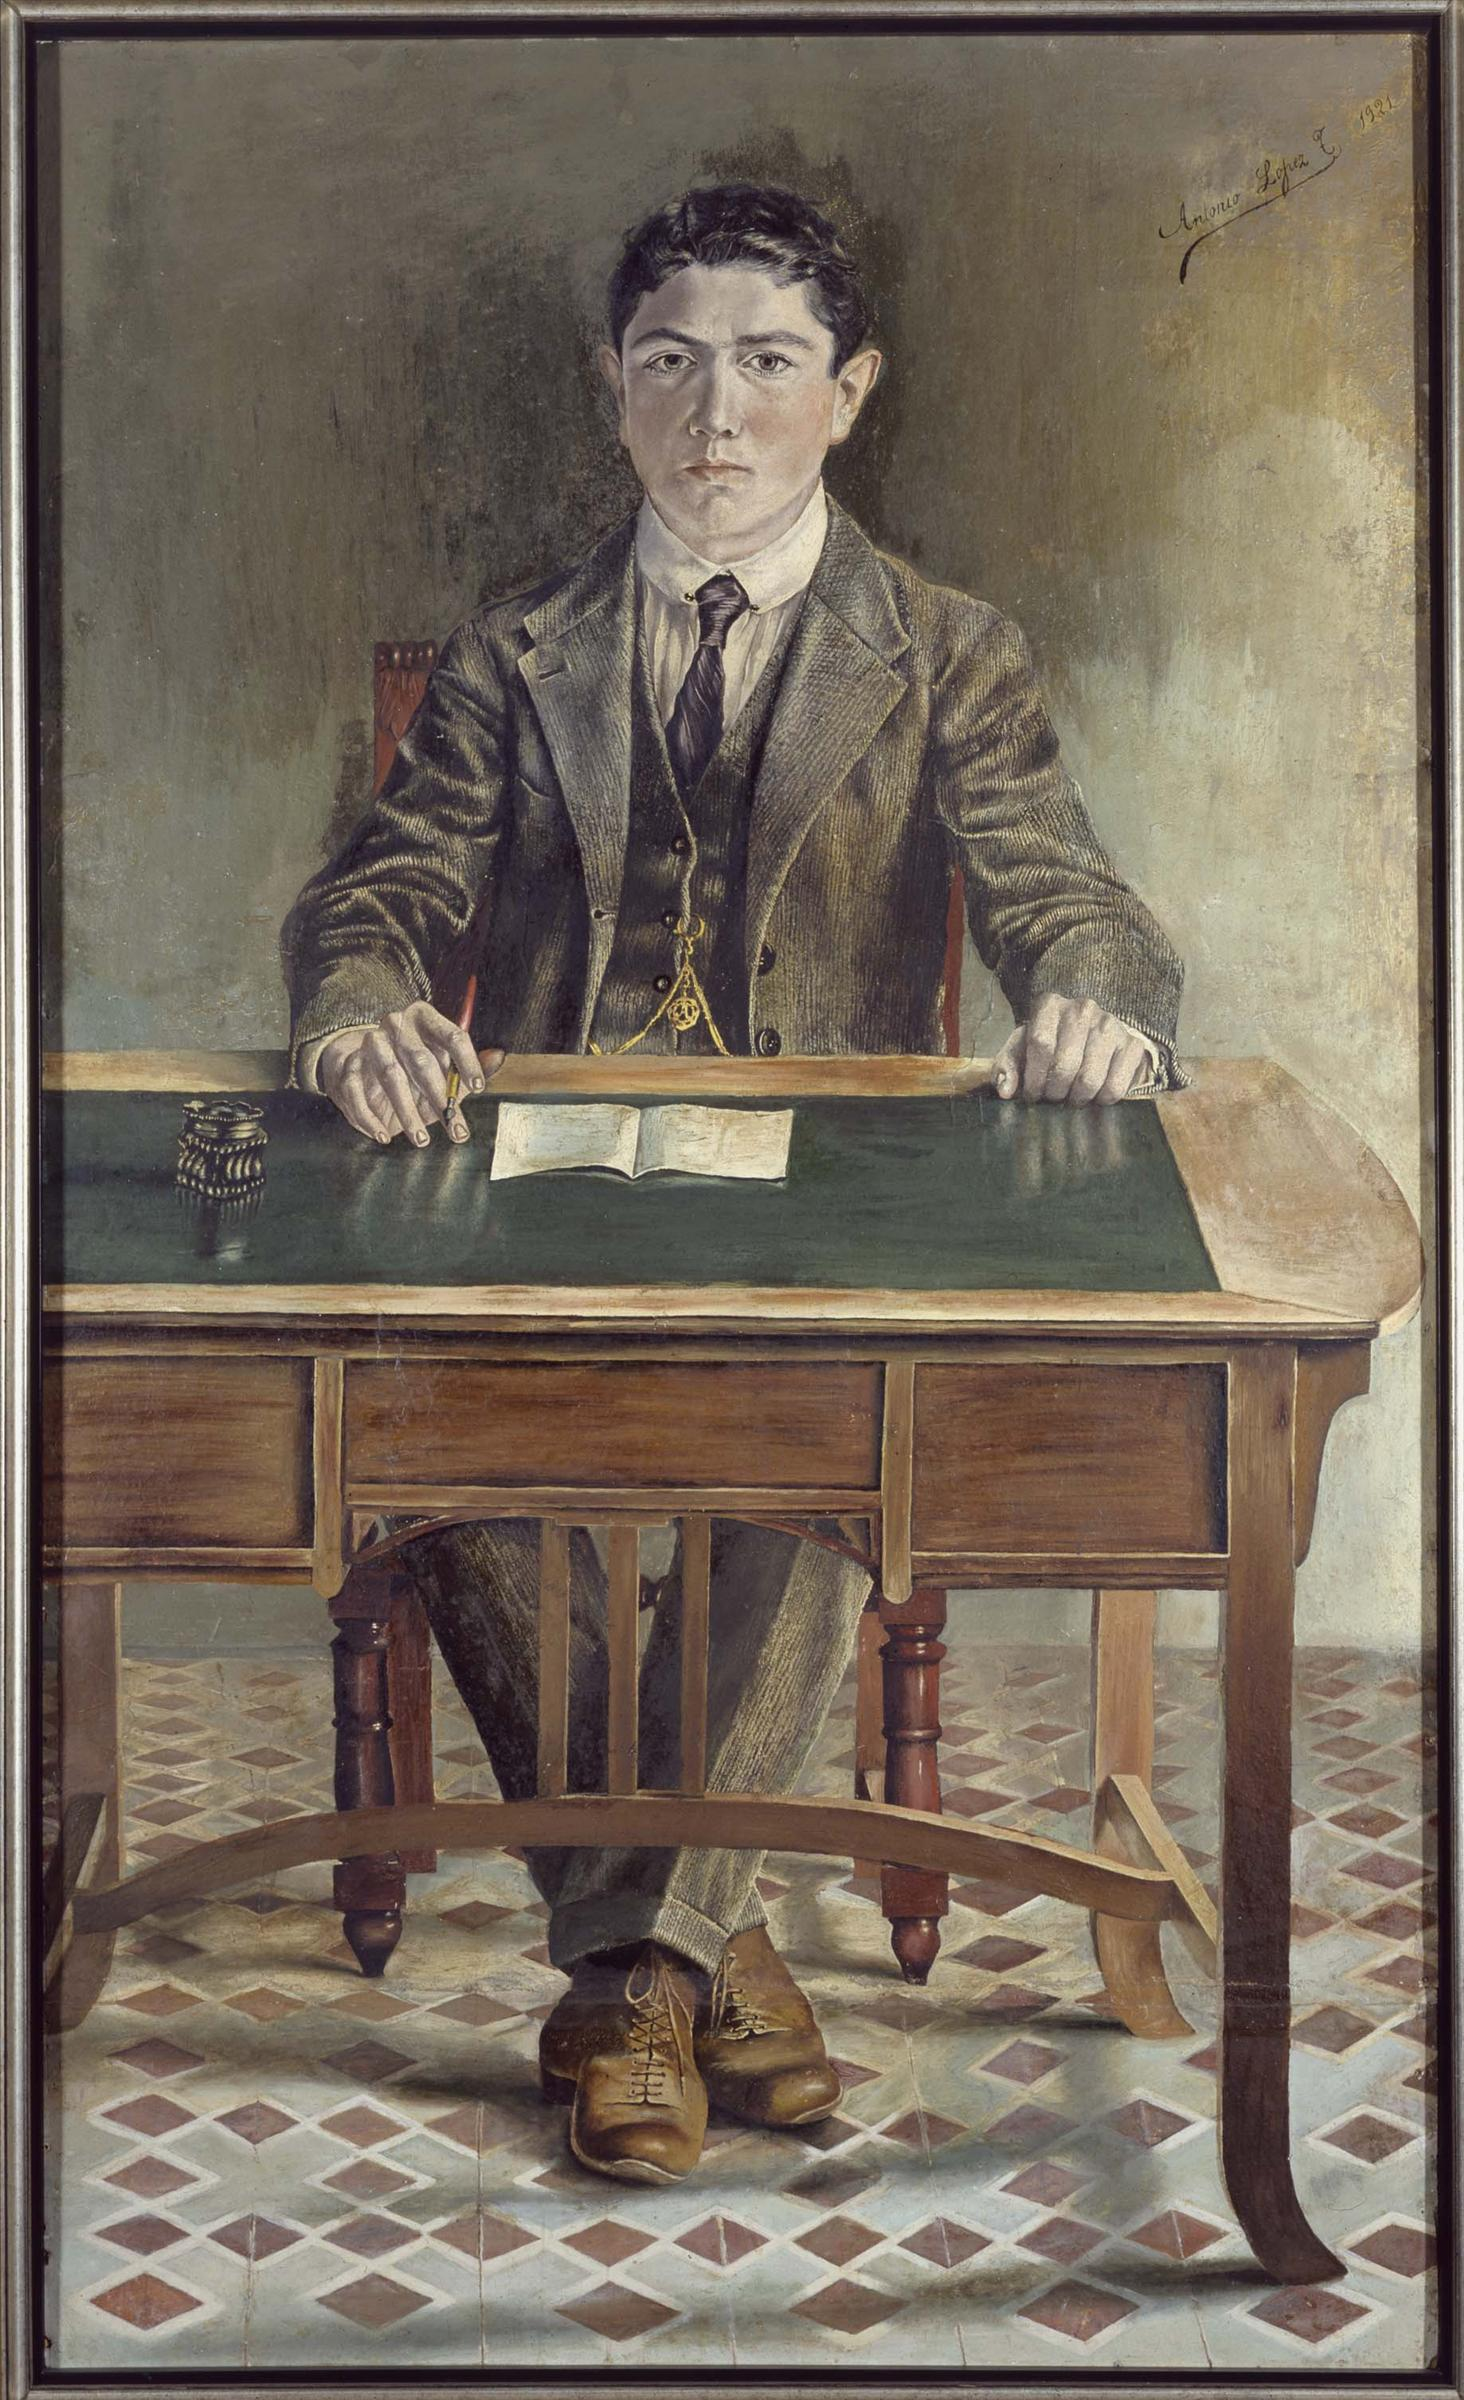 Autorretrato. Óleo sobre cartón. 1921. Museo Reina Sofía